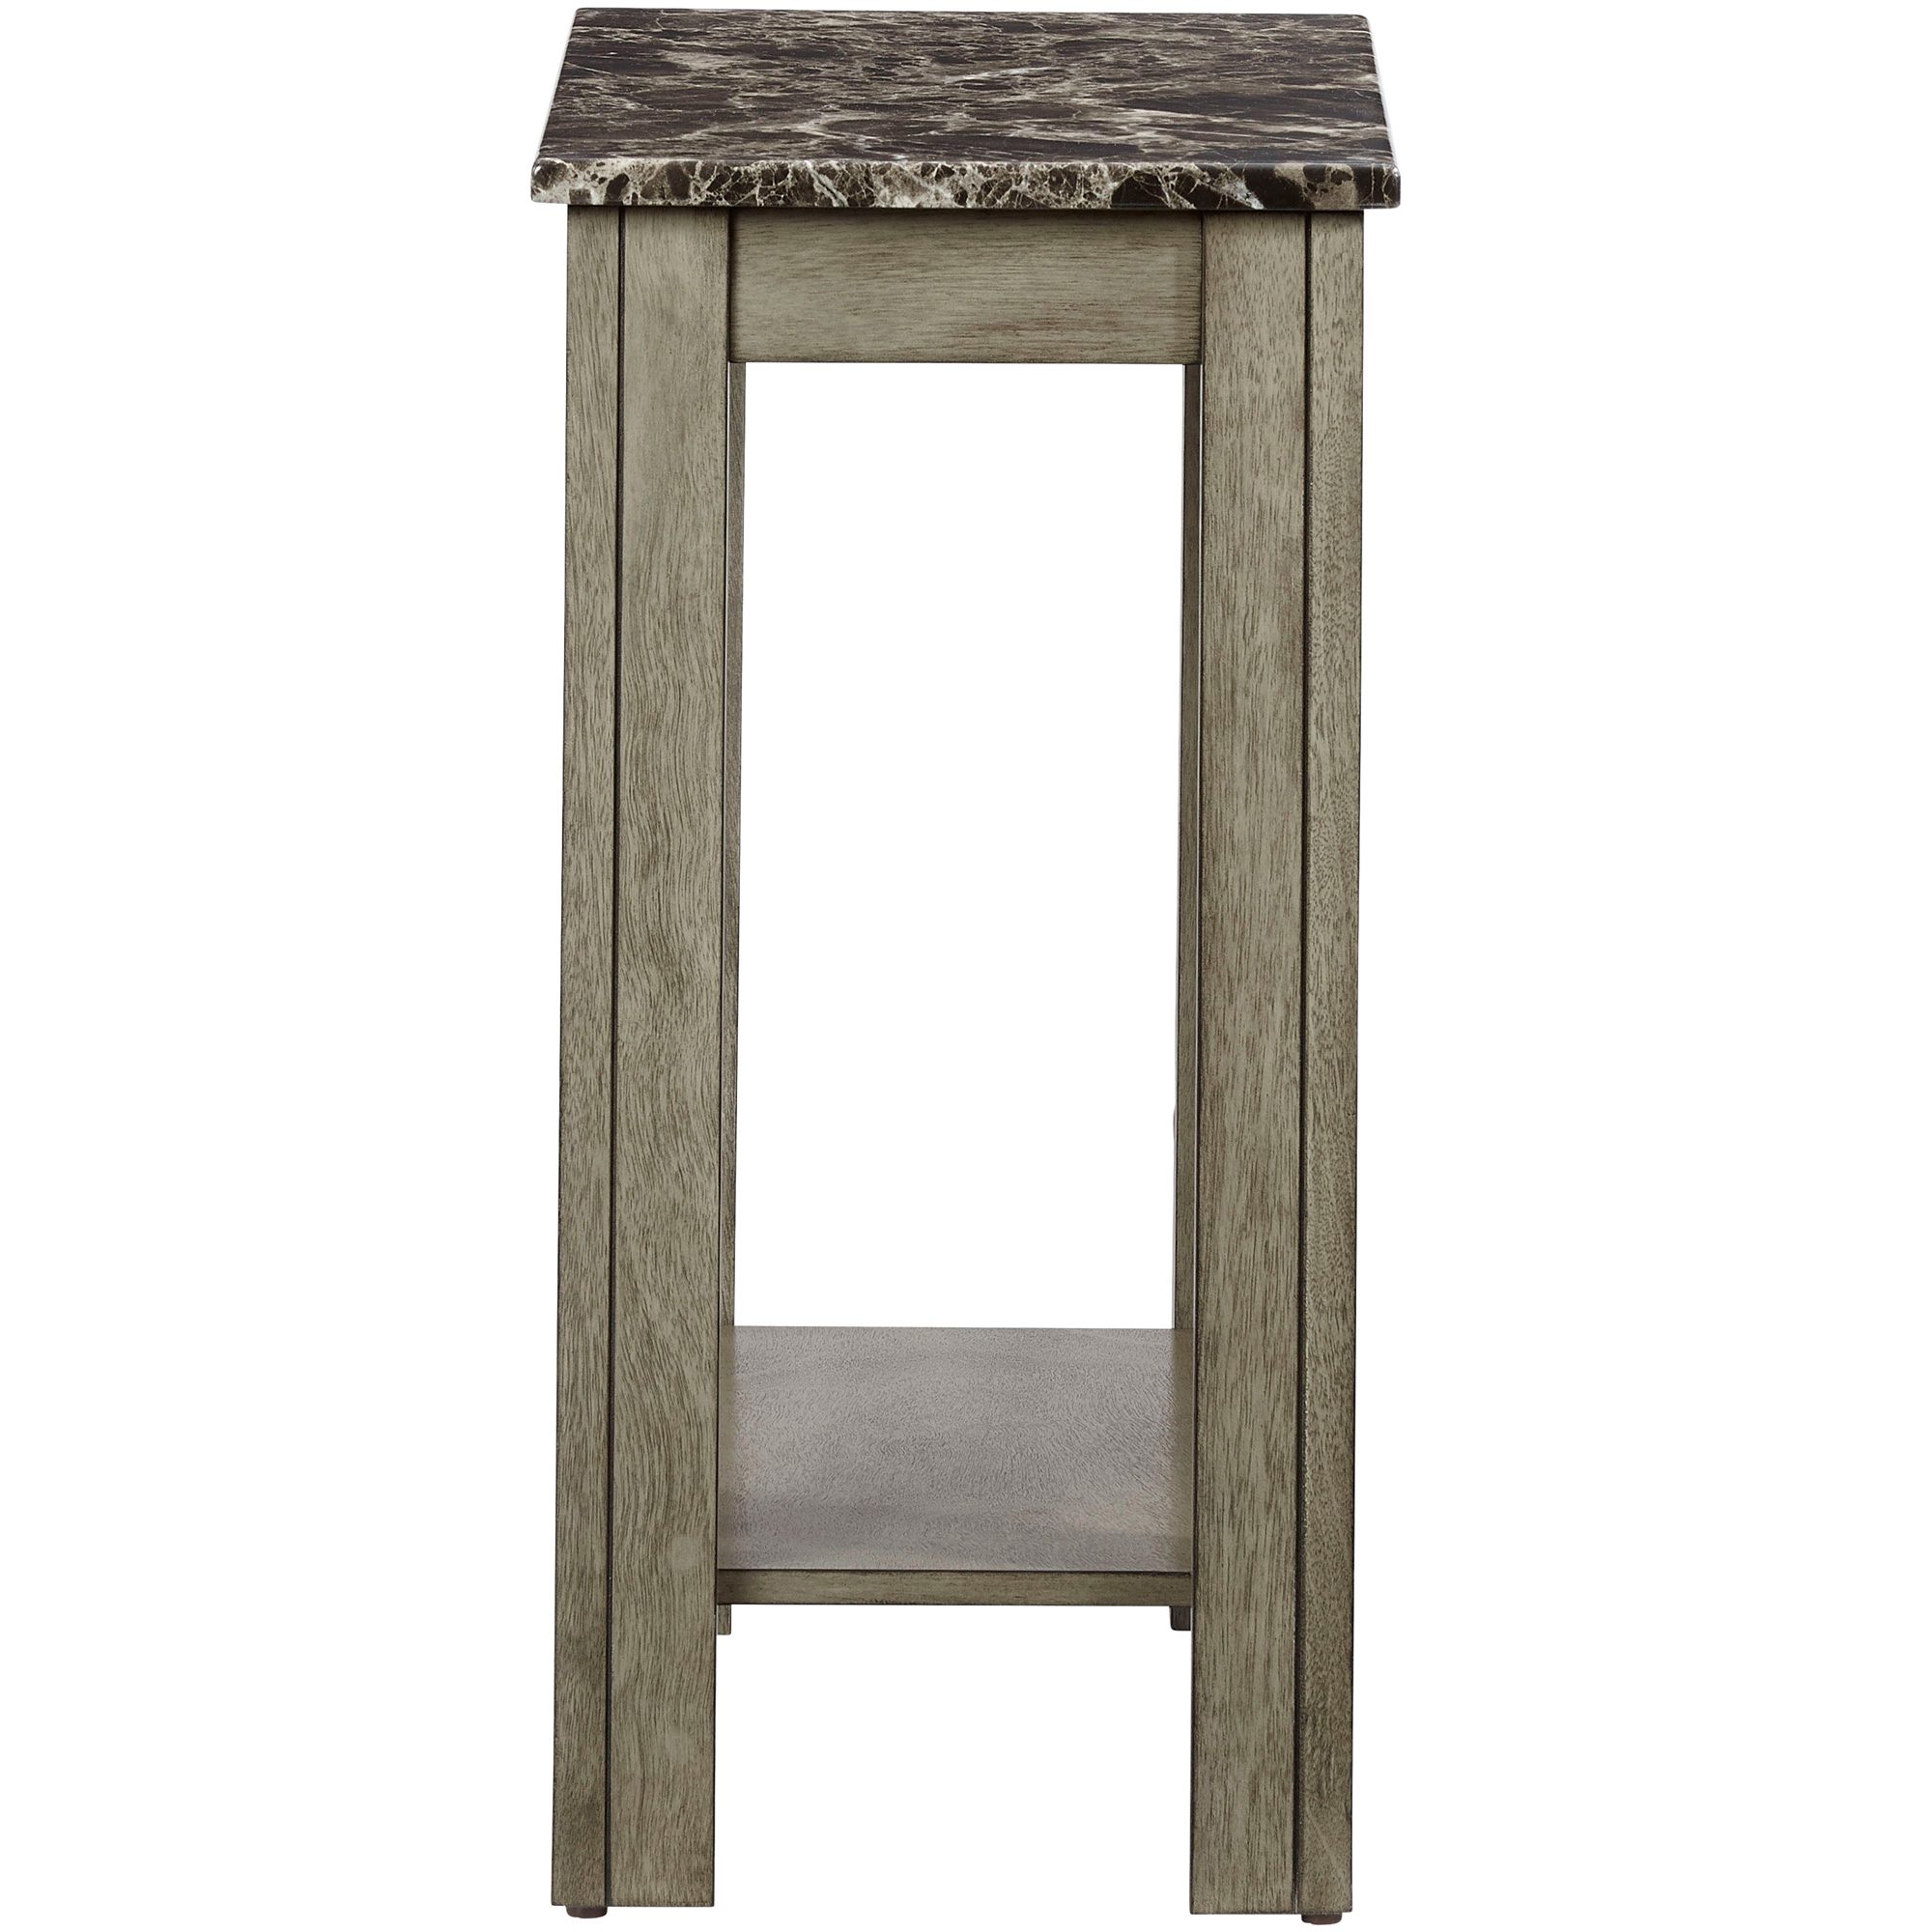 Progressive | Chairsides III Gray Chairside Table